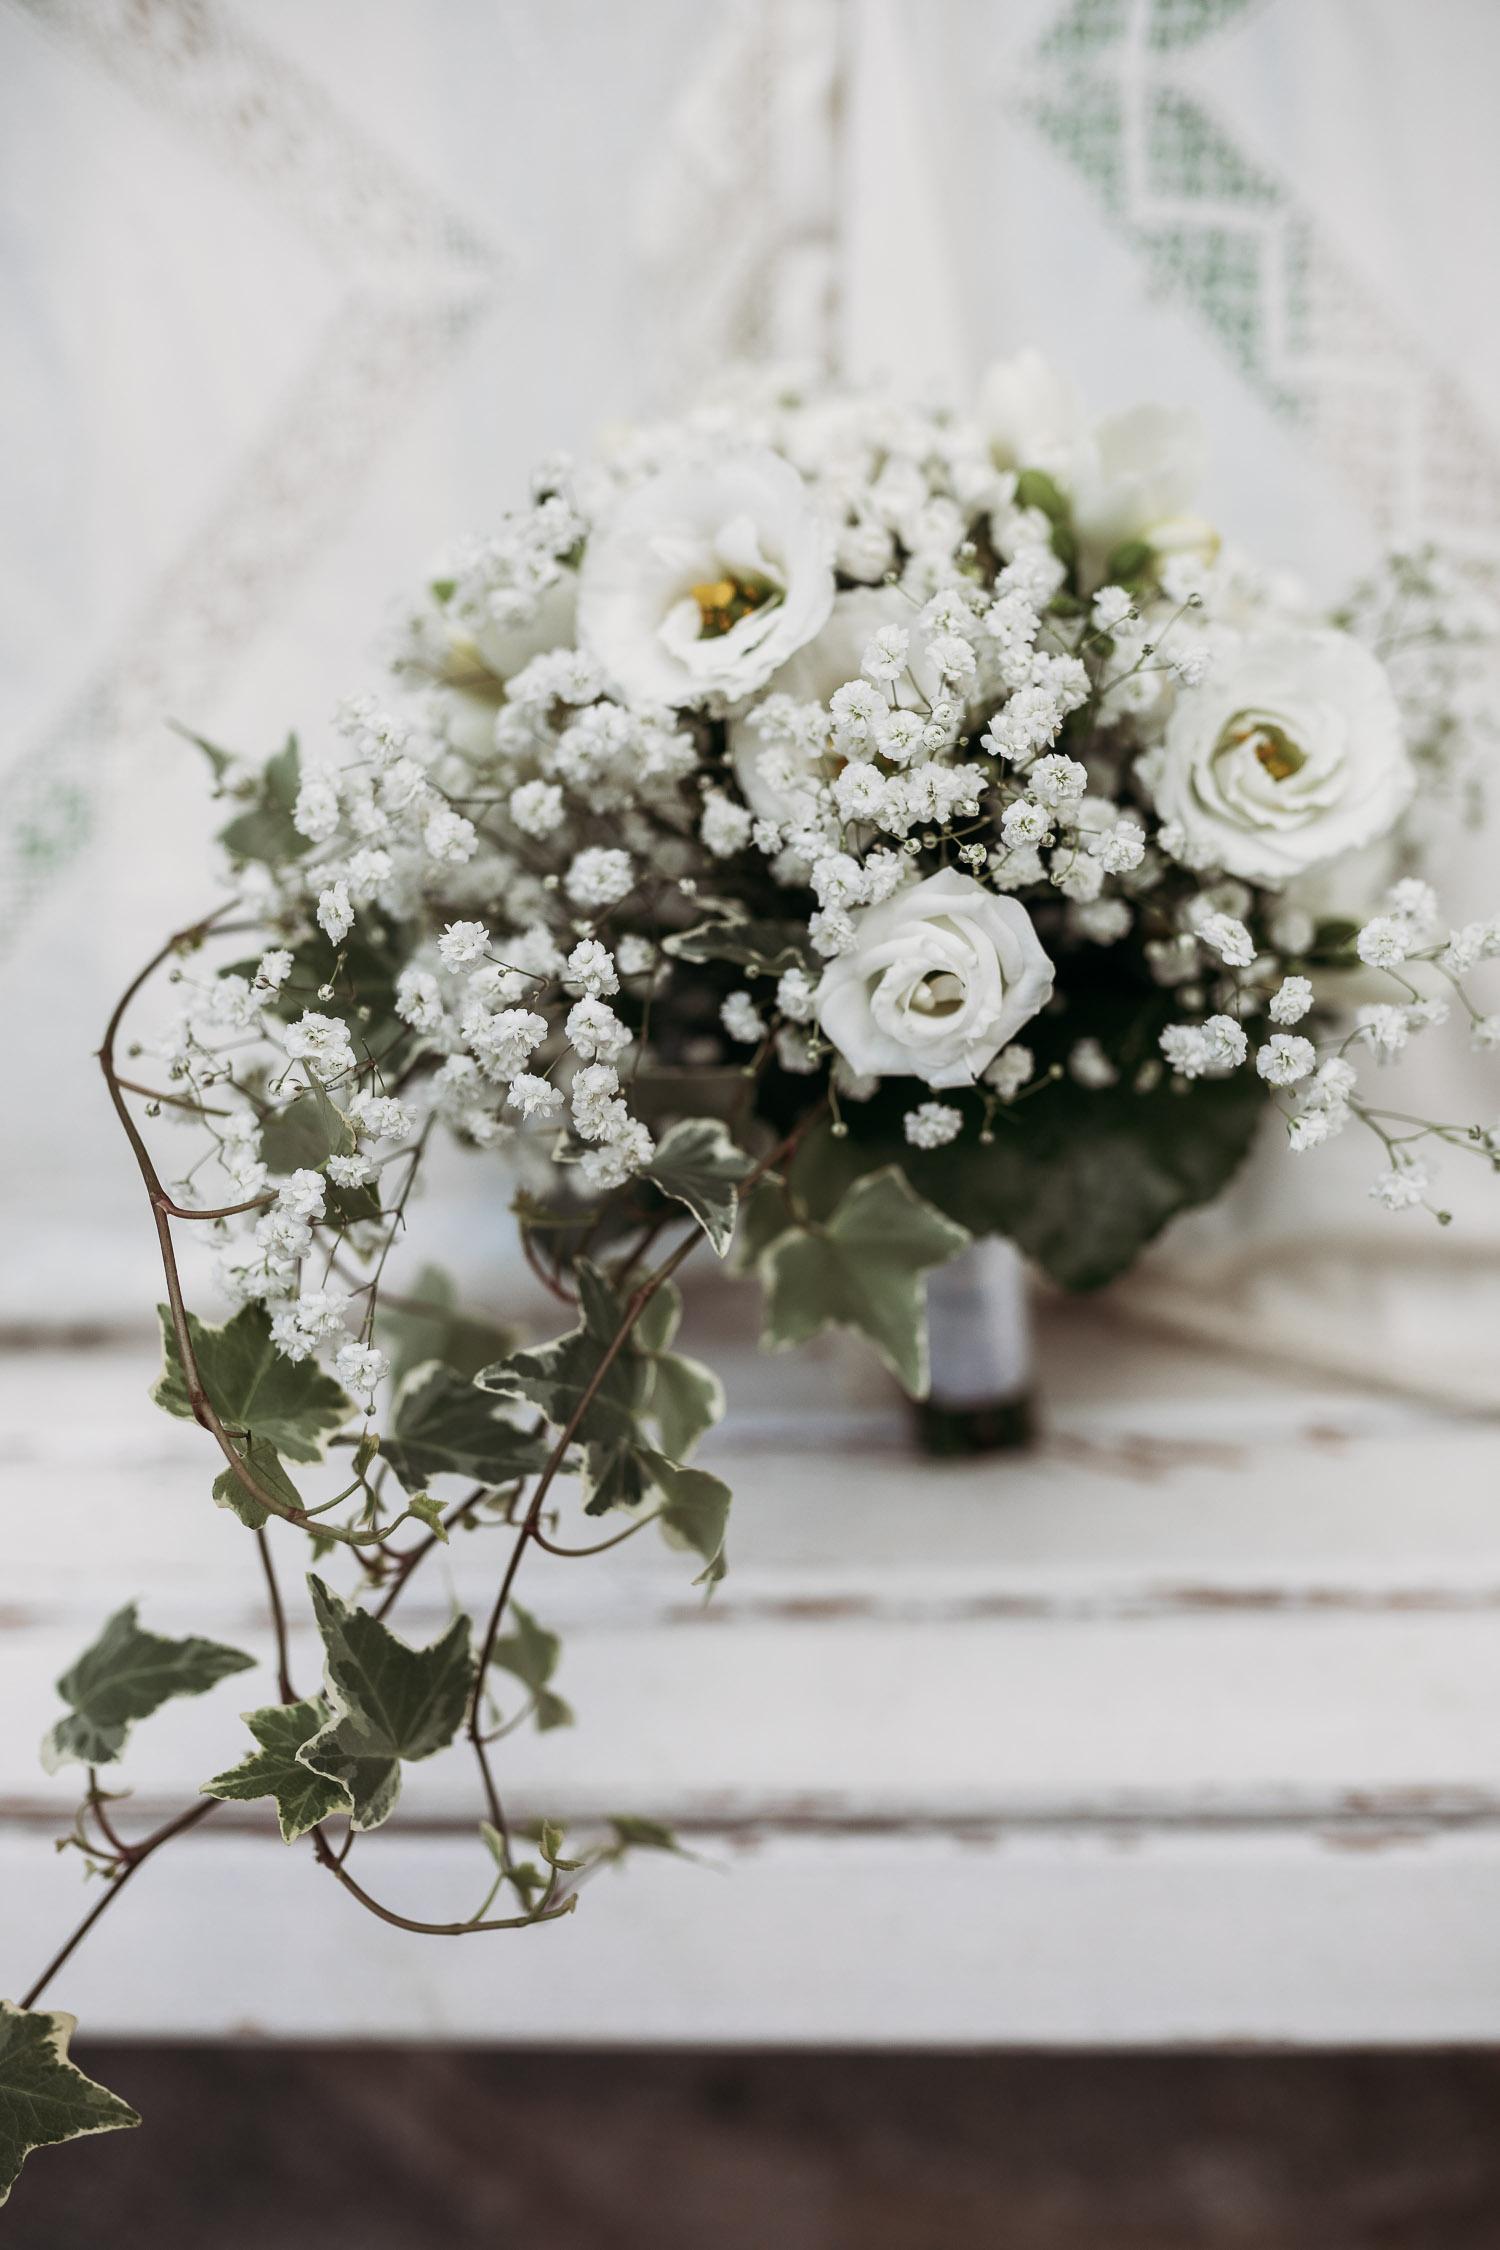 Bouquet da sposa a goccia con fiori bianchi